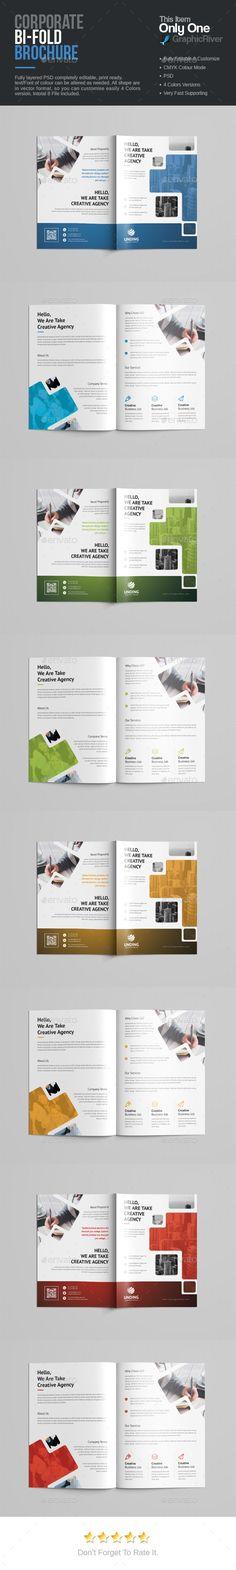 BiFold Brochure — Photoshop PSD #green #web • Download ➝ https://graphicriver.net/item/bifold-brochure/19108937?ref=pxcr